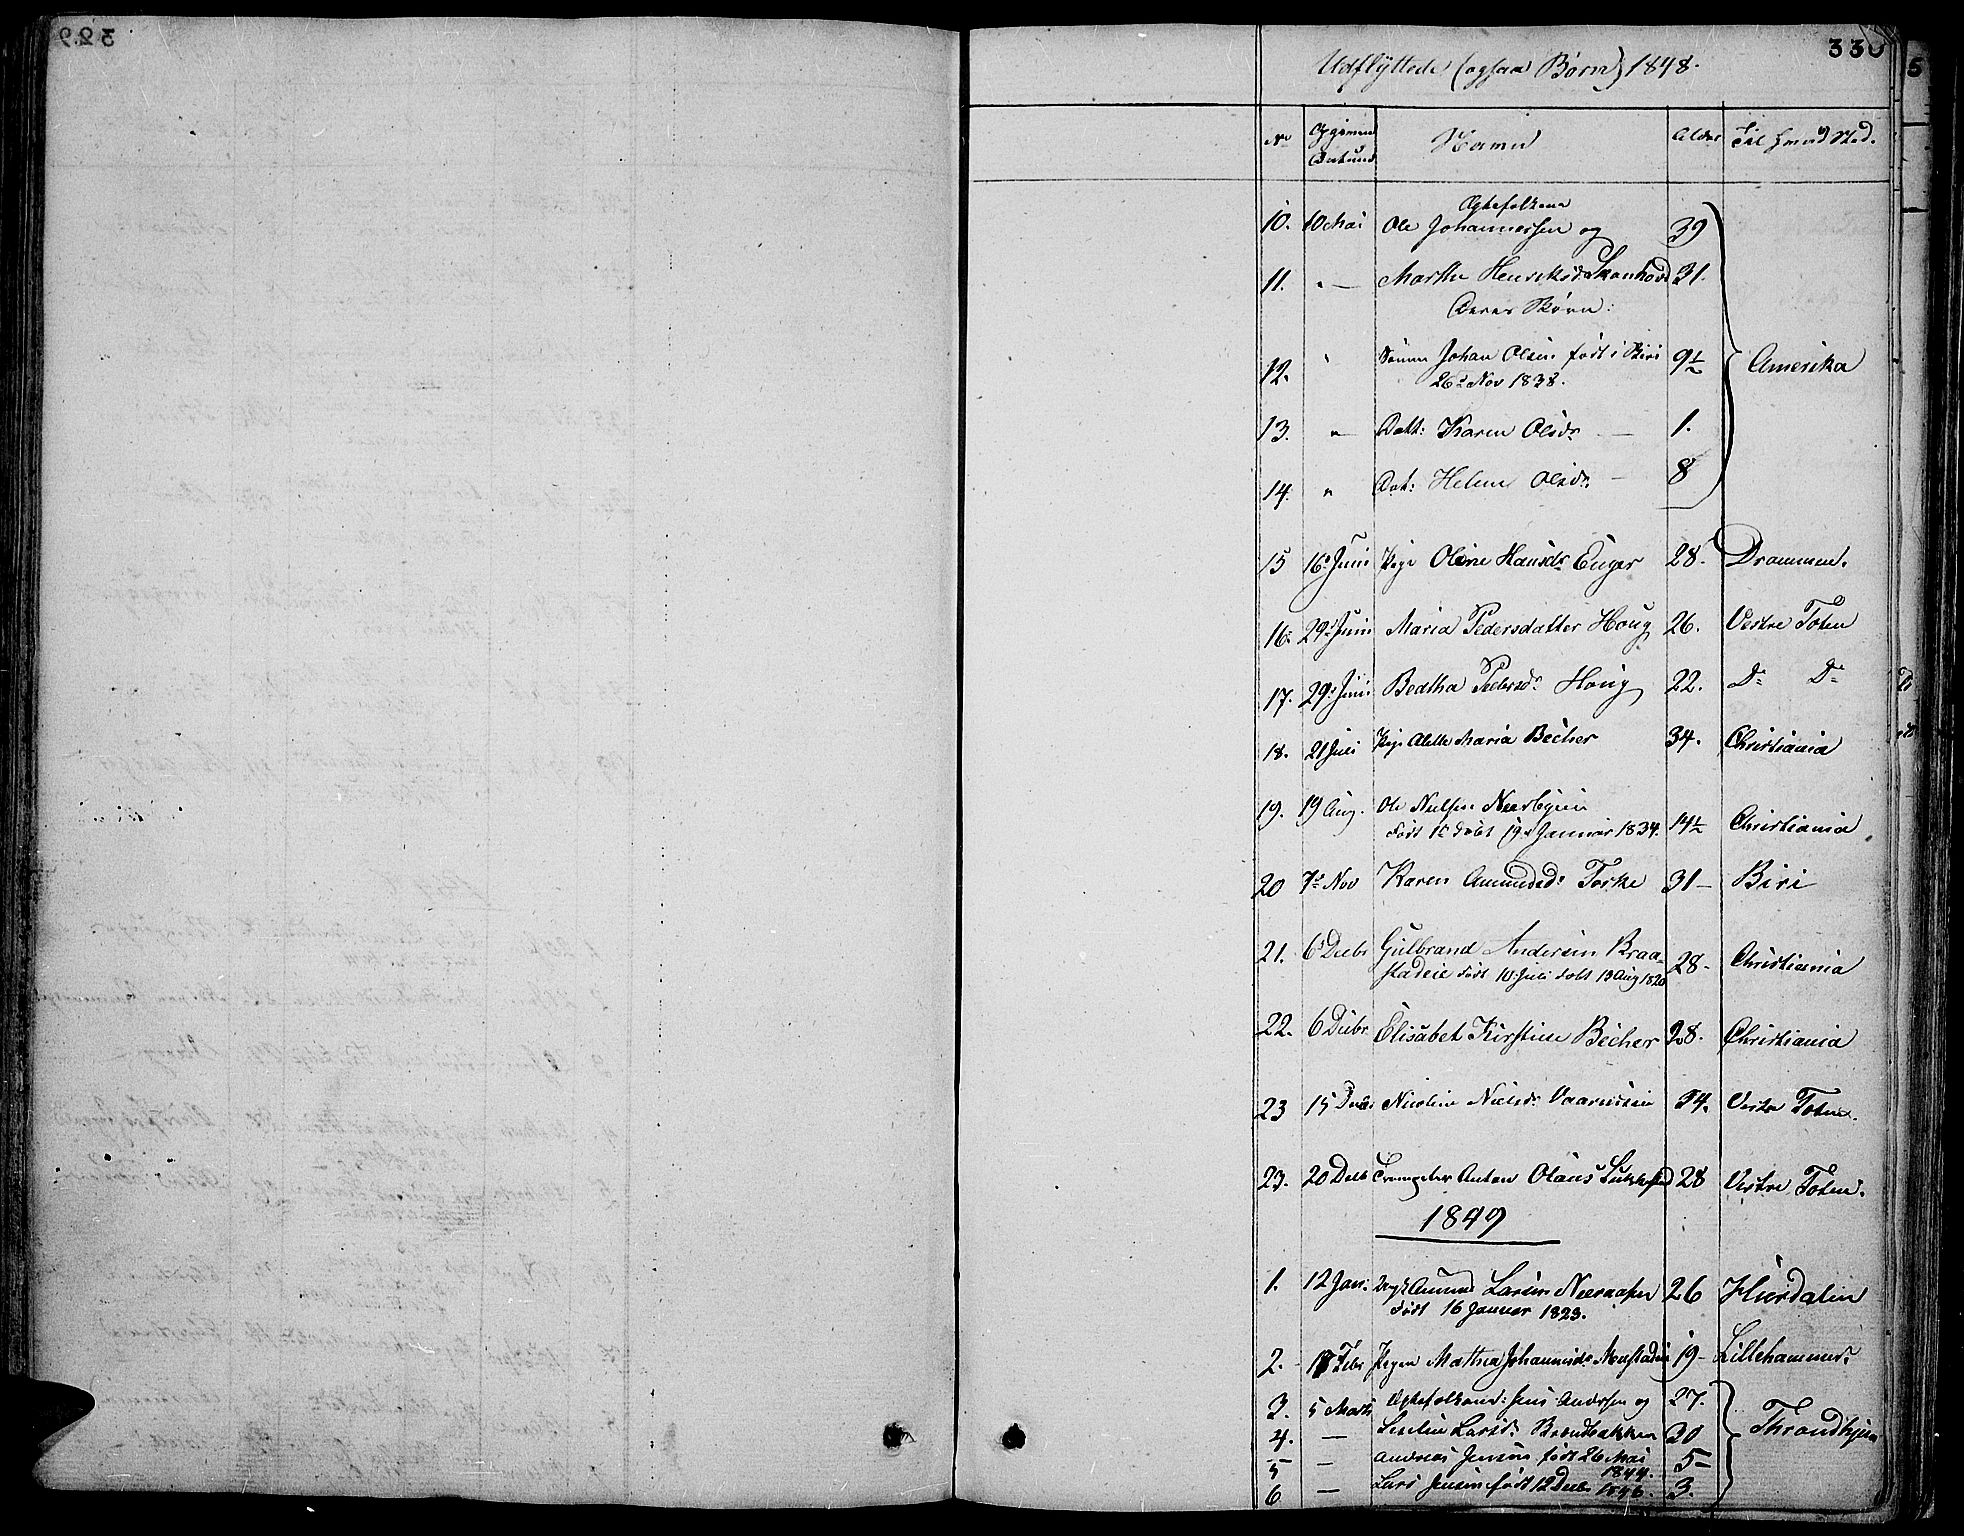 SAH, Vardal prestekontor, H/Ha/Hab/L0004: Klokkerbok nr. 4, 1831-1853, s. 330